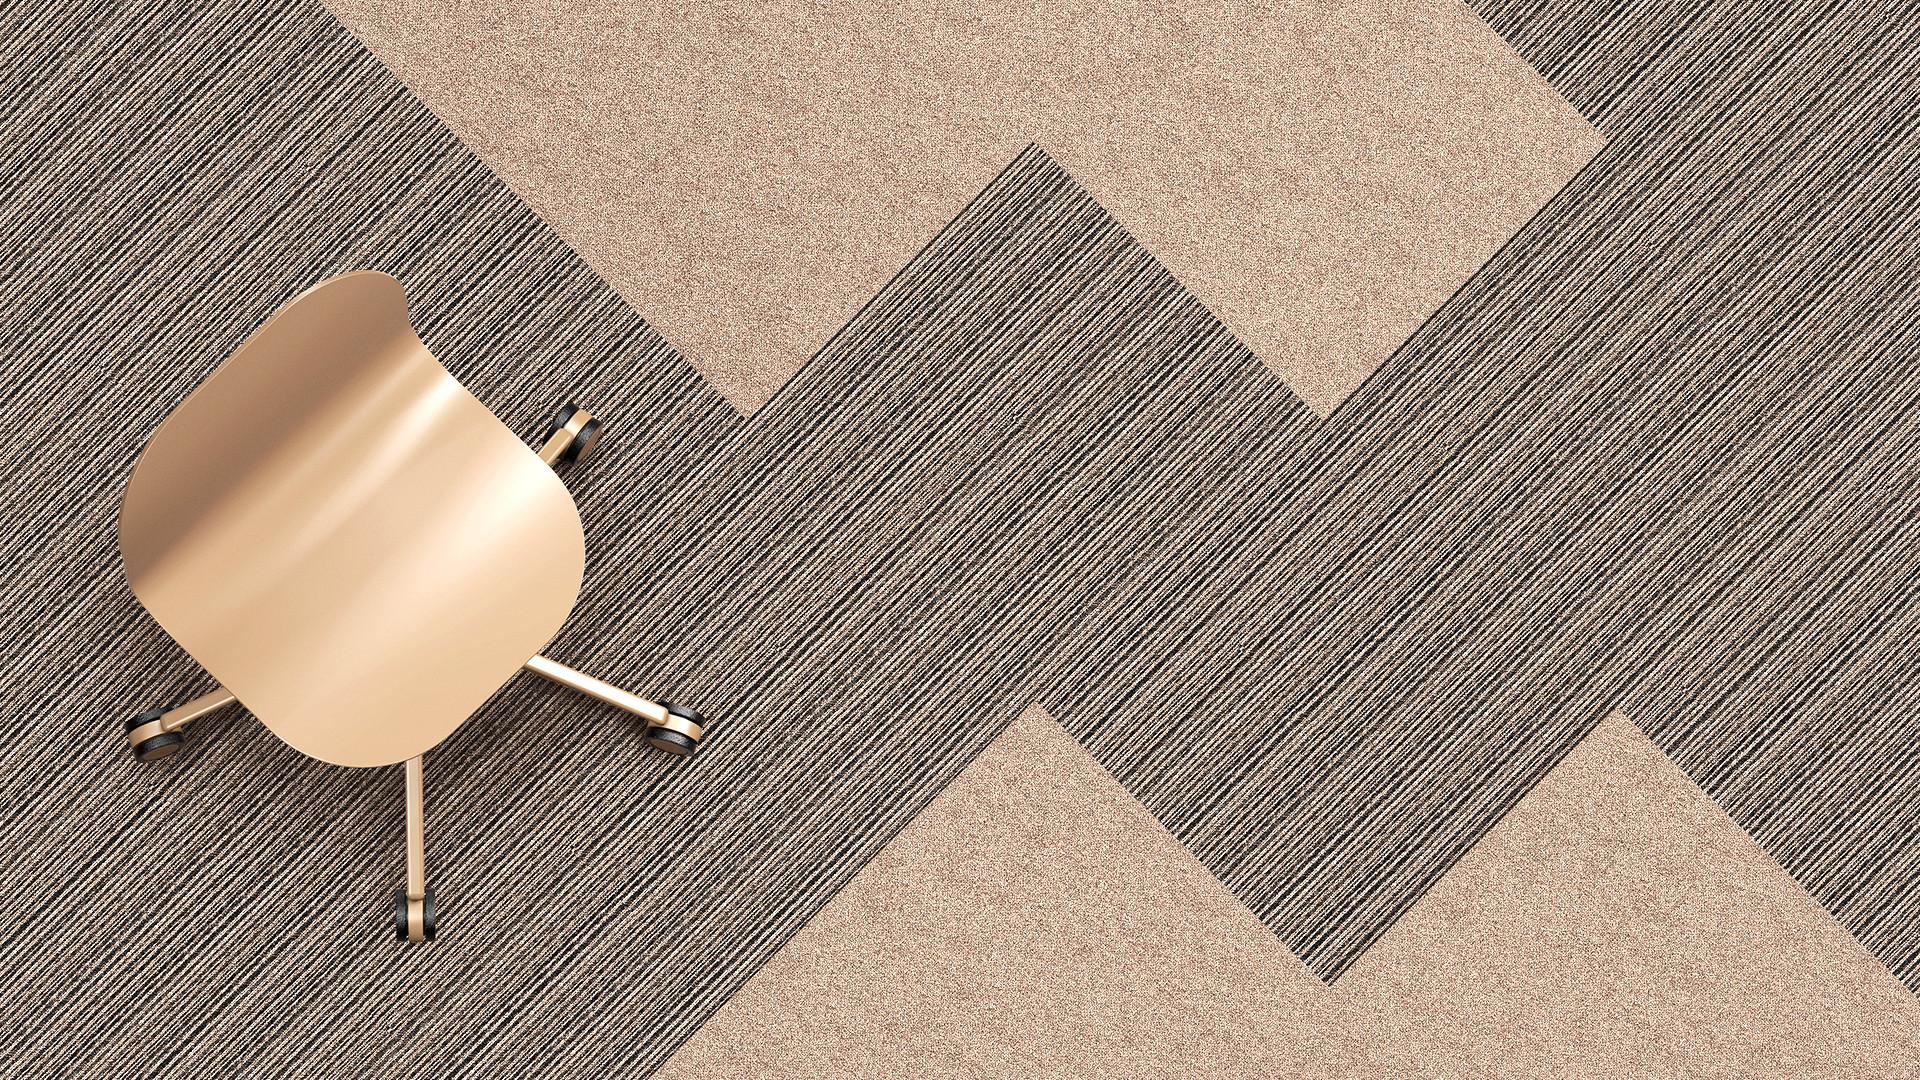 kavrolex_tile_carpet_00001_1.jpg